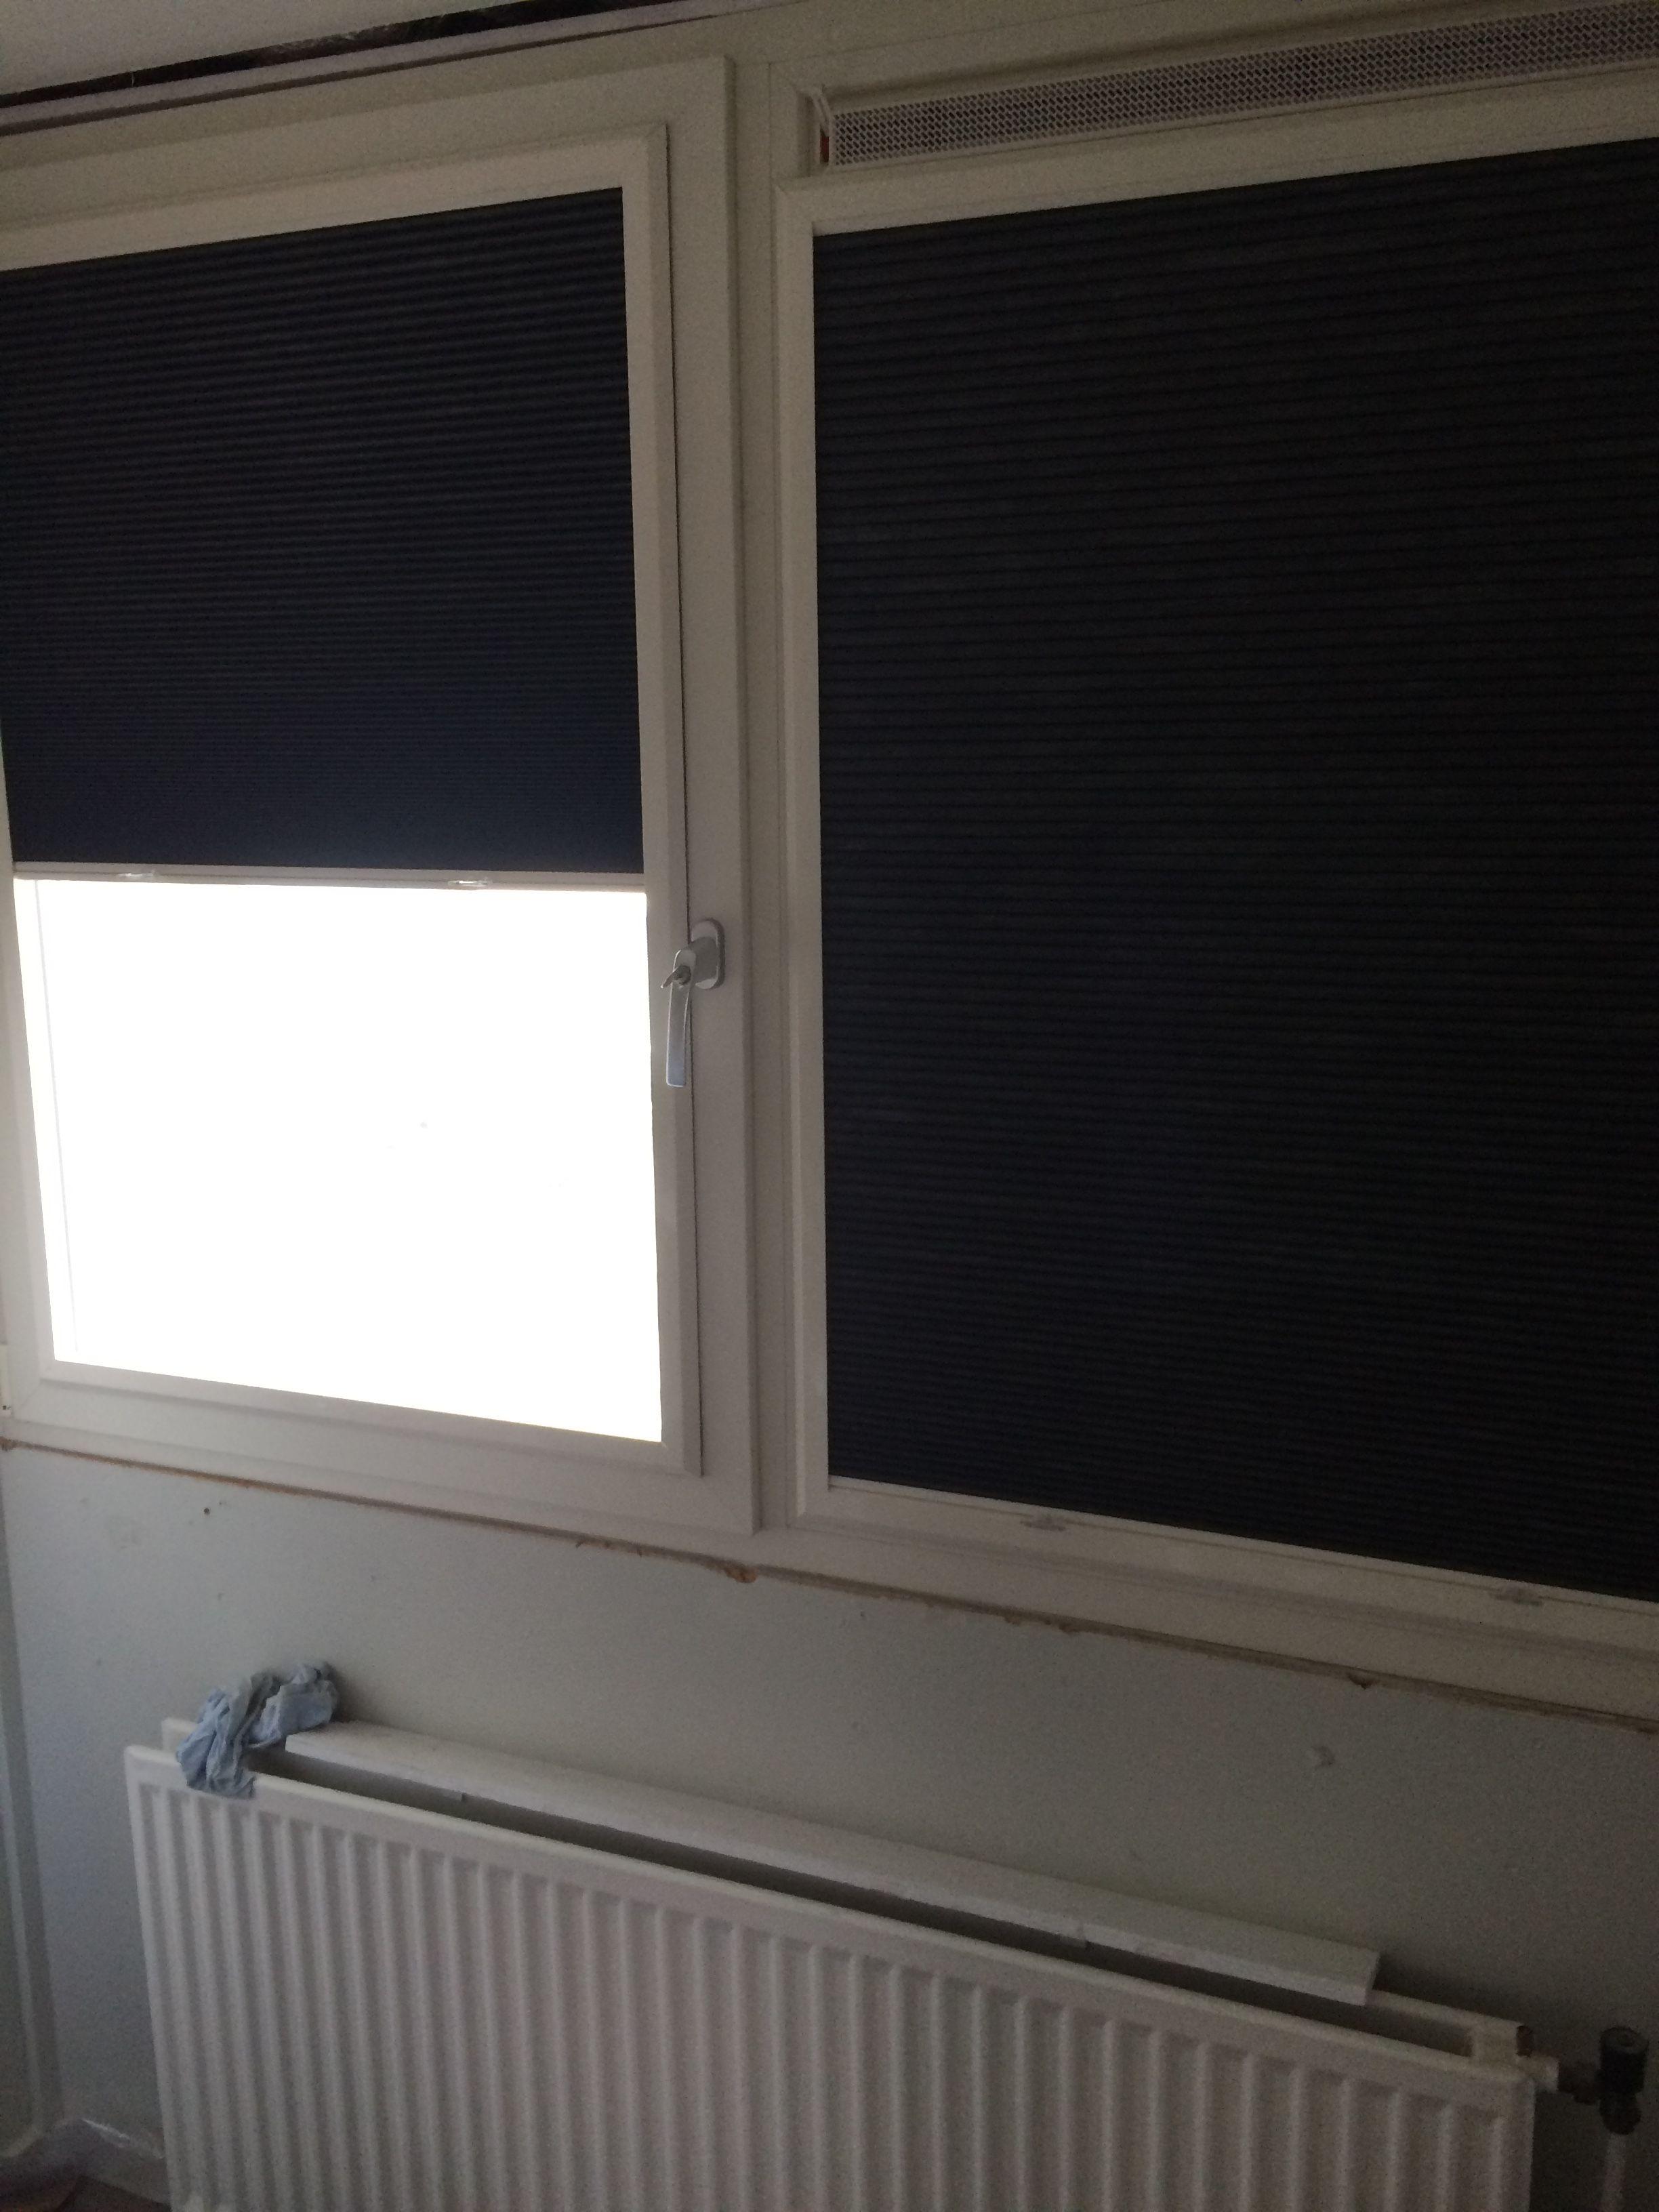 Zeer Easy click van #toppoint | Binnen zonwering - Home appliances KK61